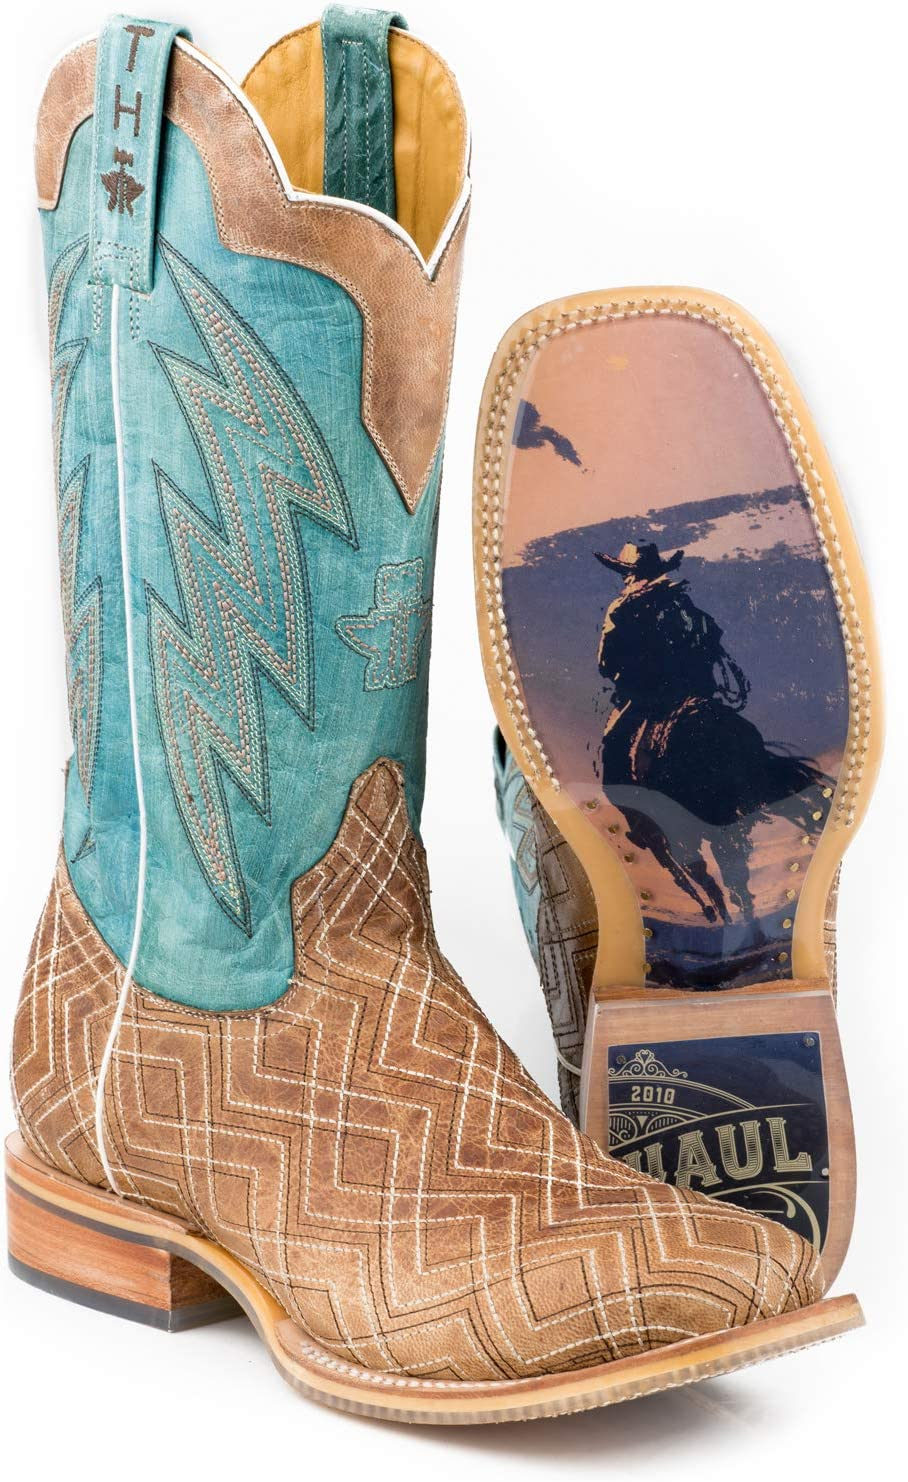 shipfree Tin Haul Mens Boots Now on sale Matrix